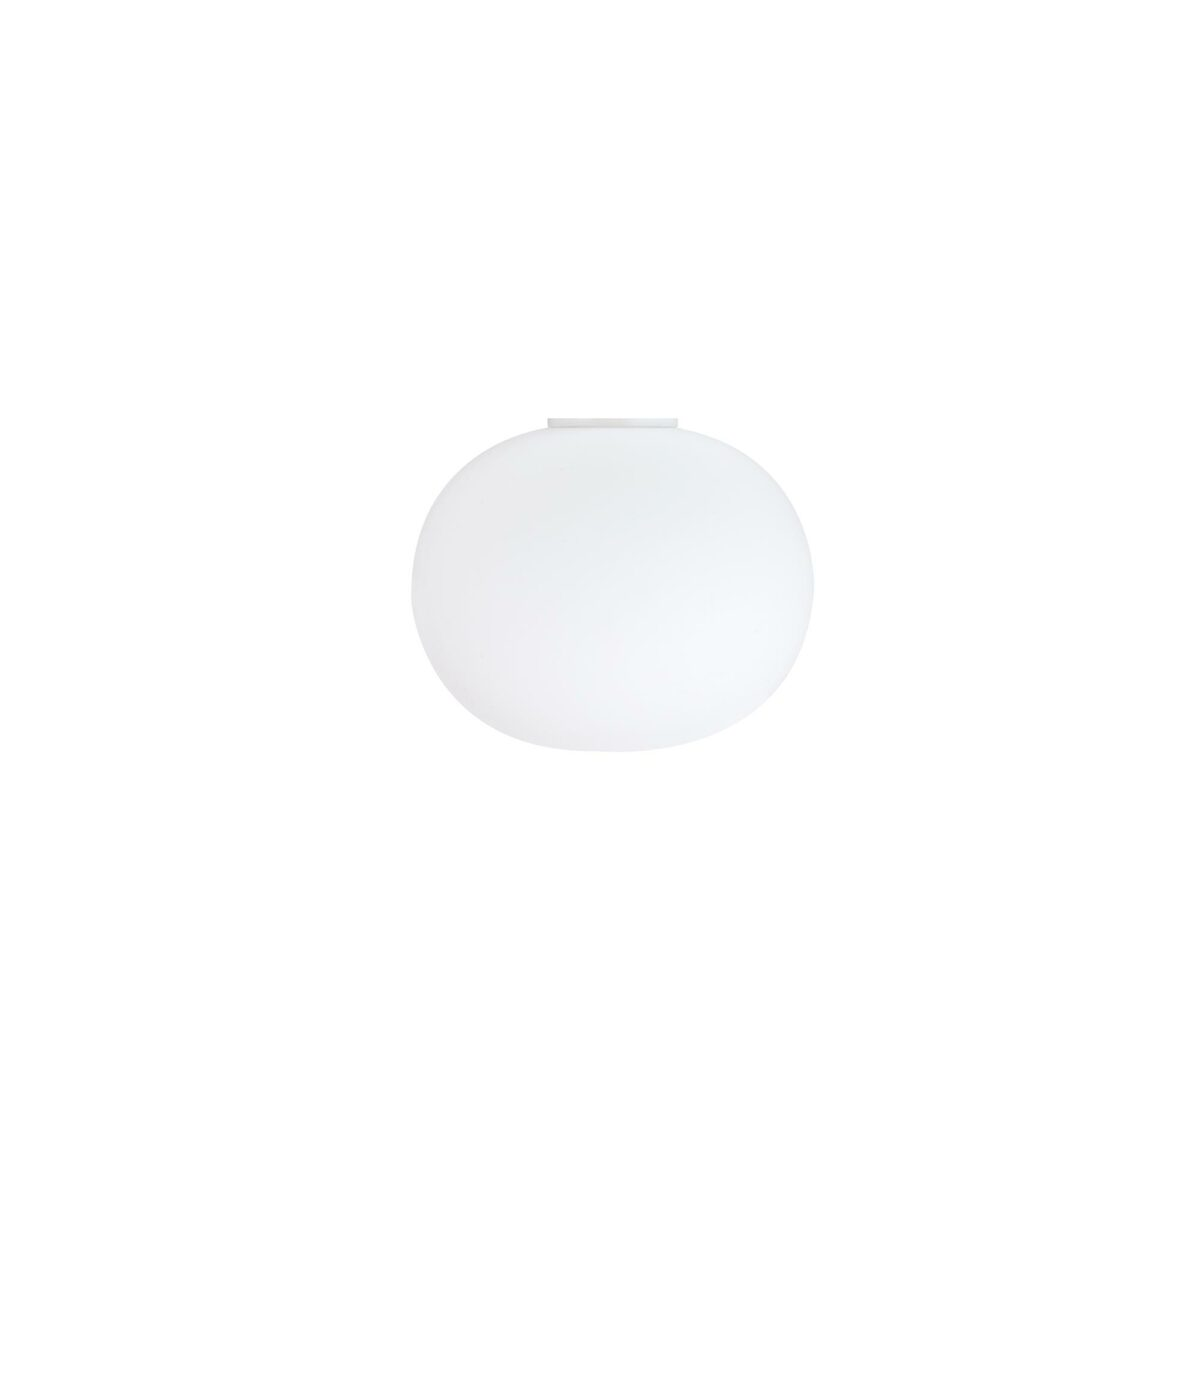 glo ball ceiling wall 1 morrison flos F3023000 product still life big 1